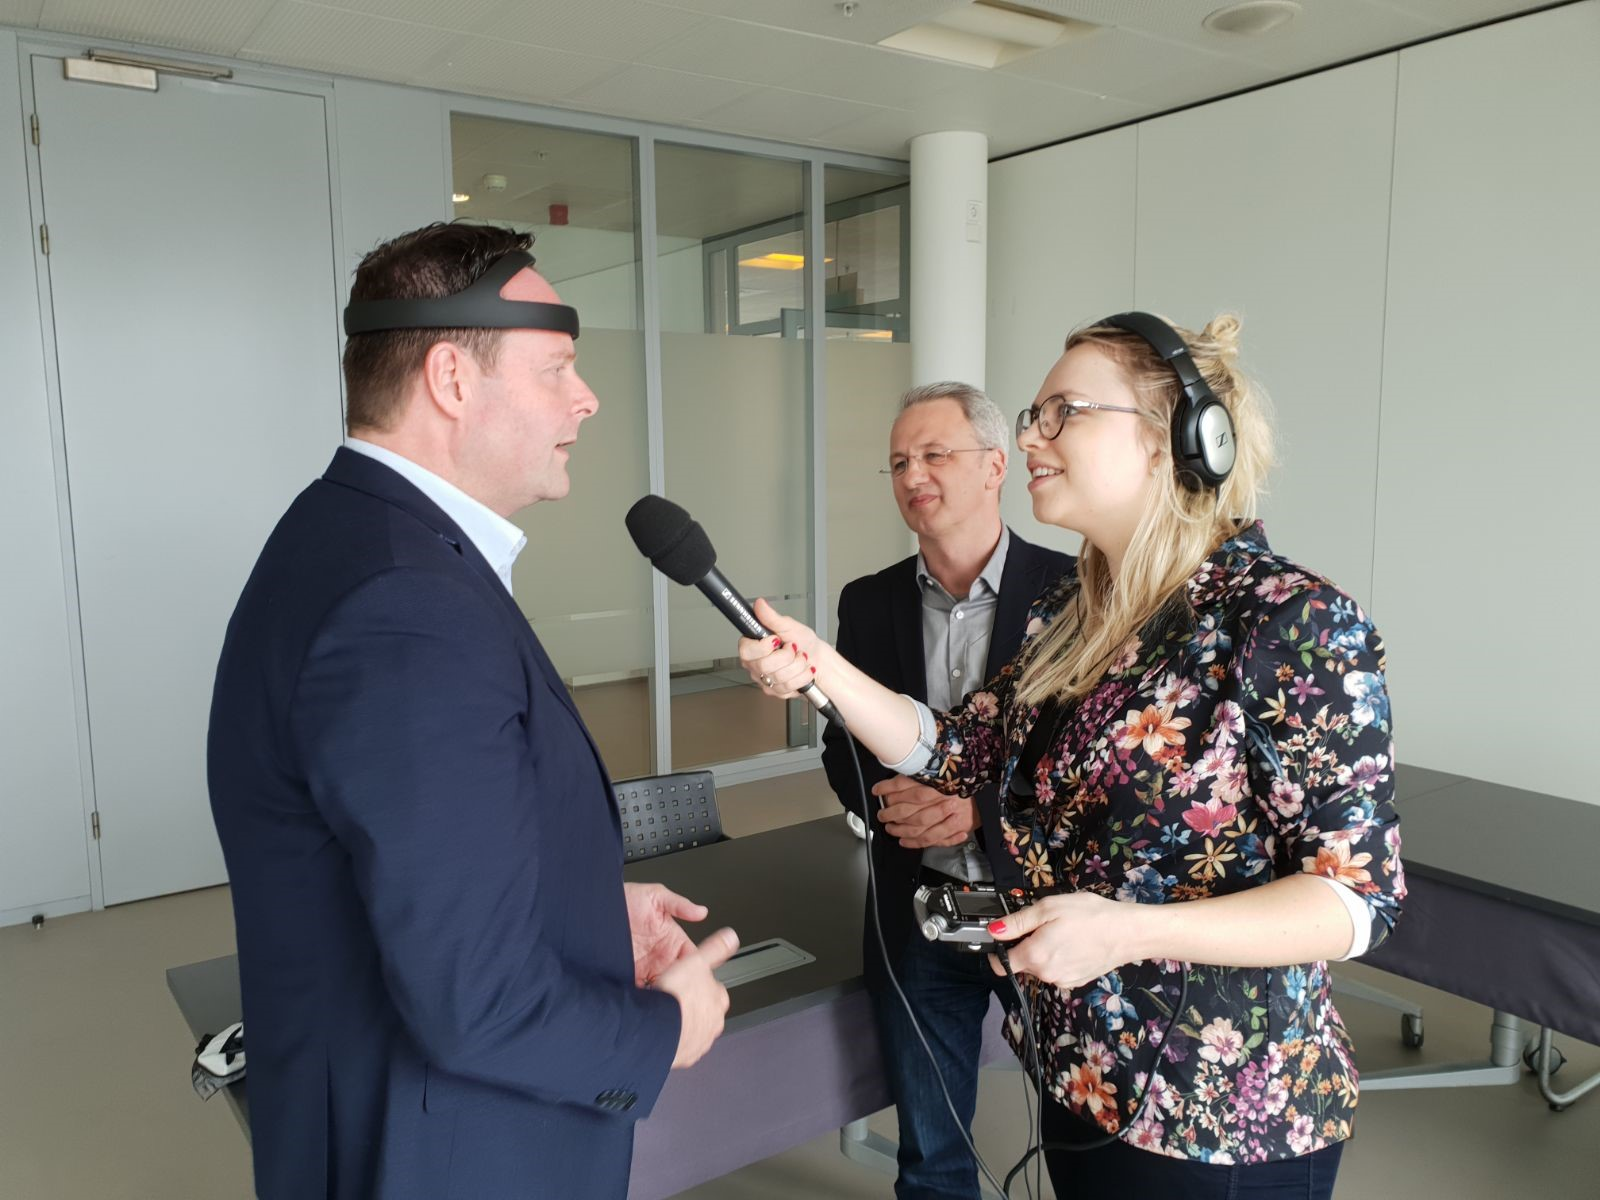 High Tech Podcast #2 - De toekomst van Wearable Technology